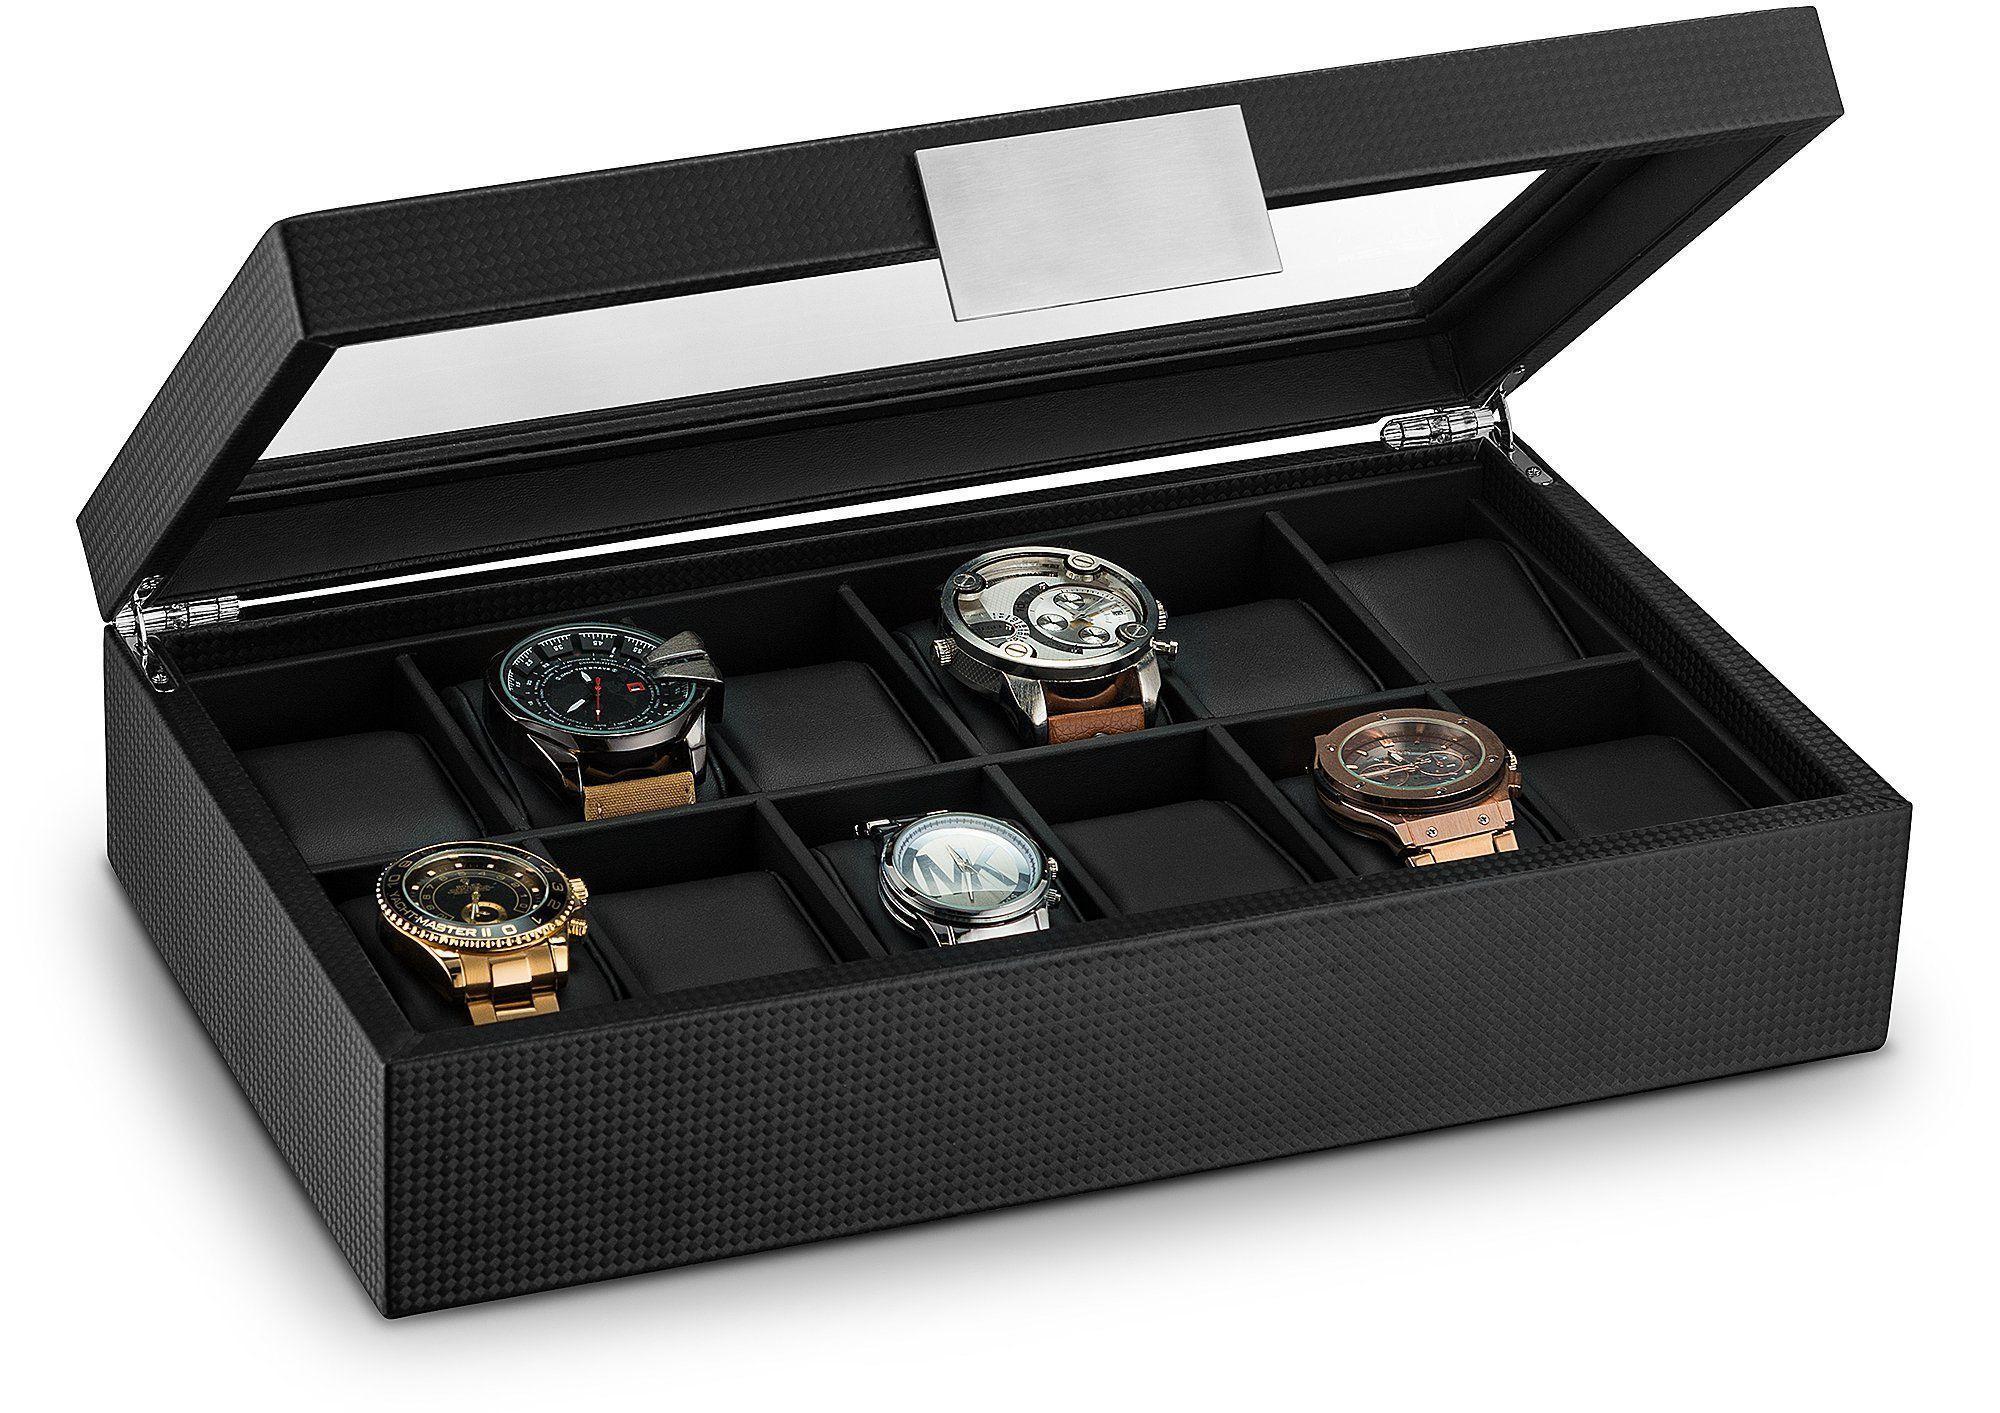 Glenor Co Watch Box For Men 12 Slot Luxury Carbon